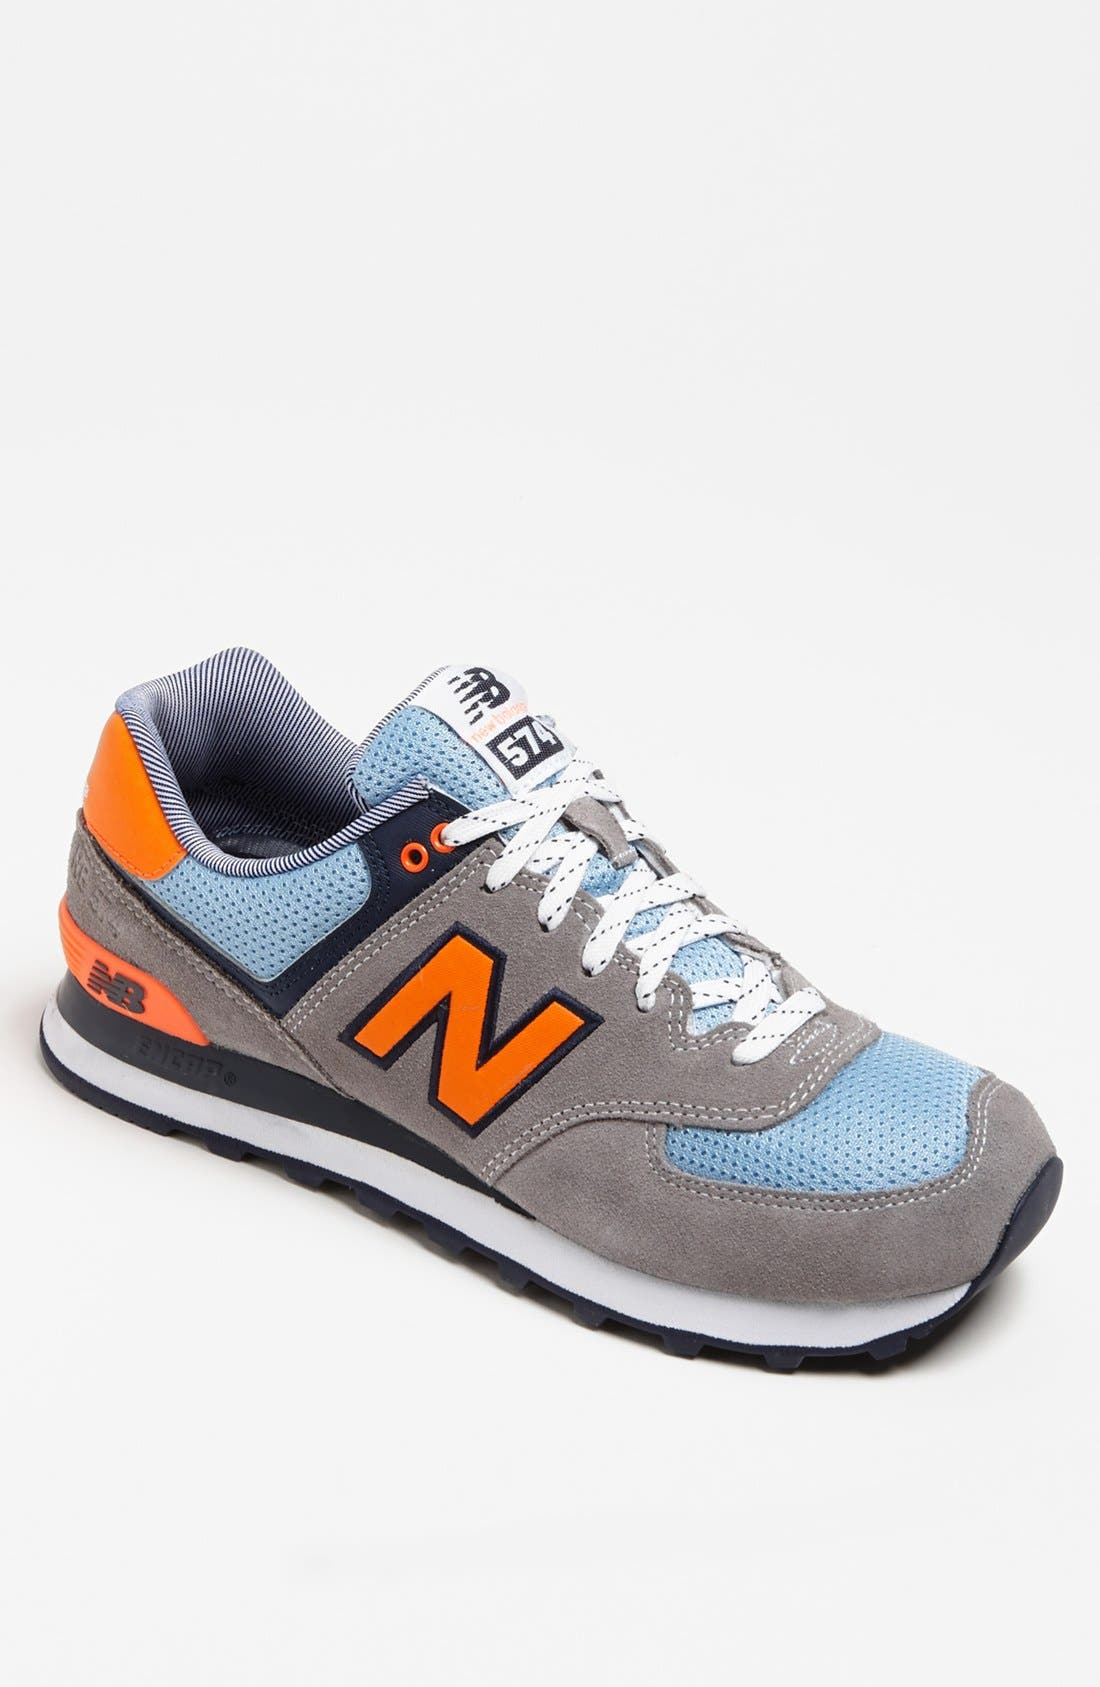 Main Image - New Balance '574 Yacht Club' Sneaker (Men)